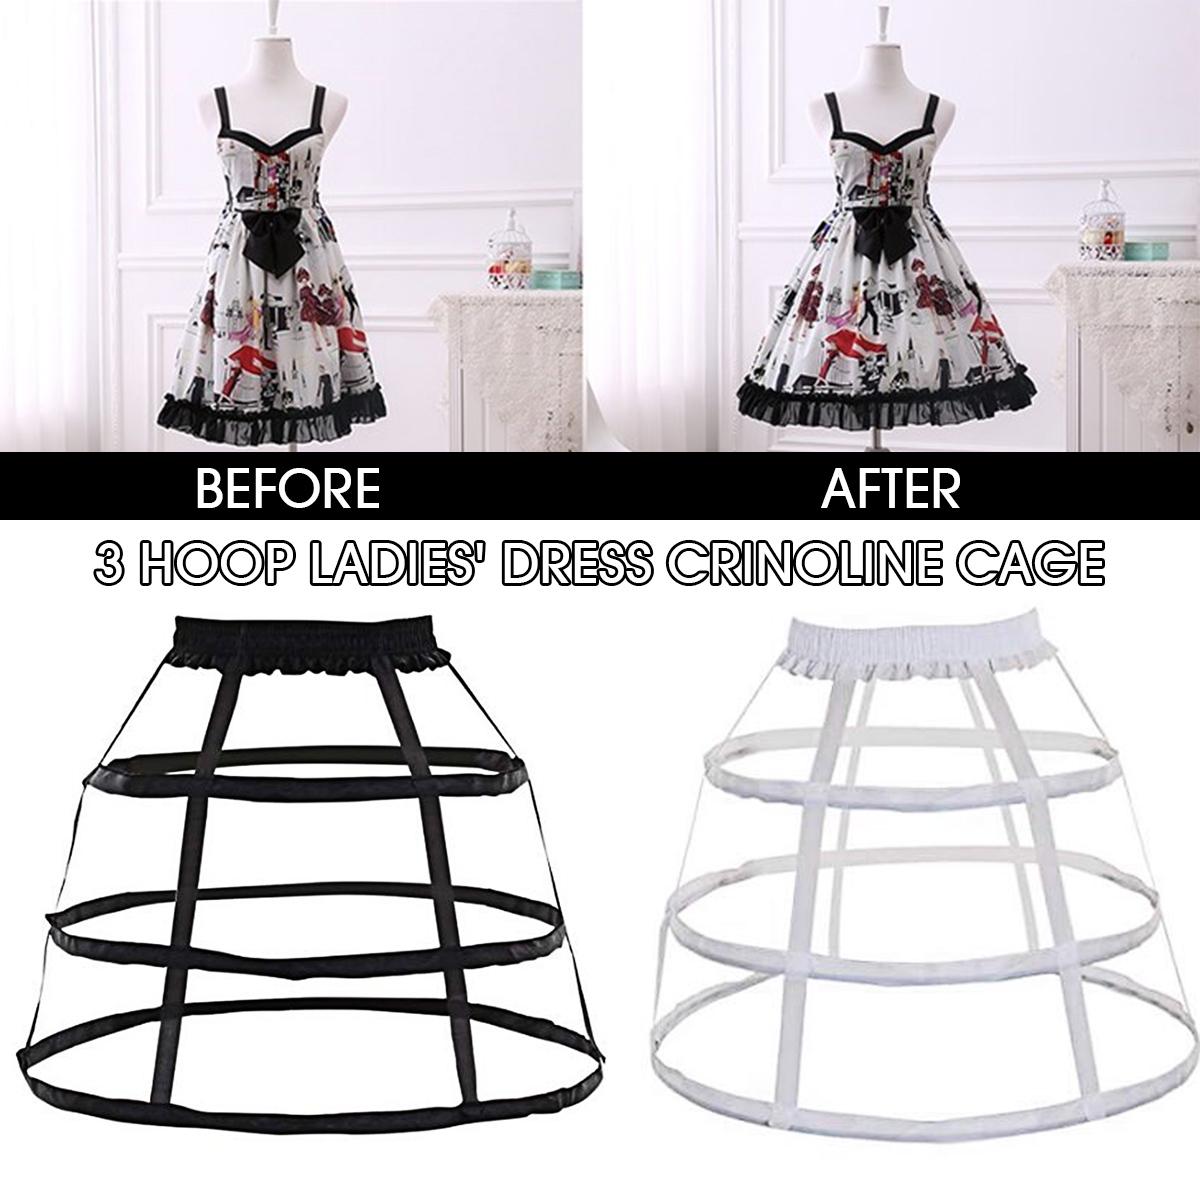 Adjustable Crinoline Hoop Cage Skirt Pannier Bustle Petticoat Underskirt  Costume